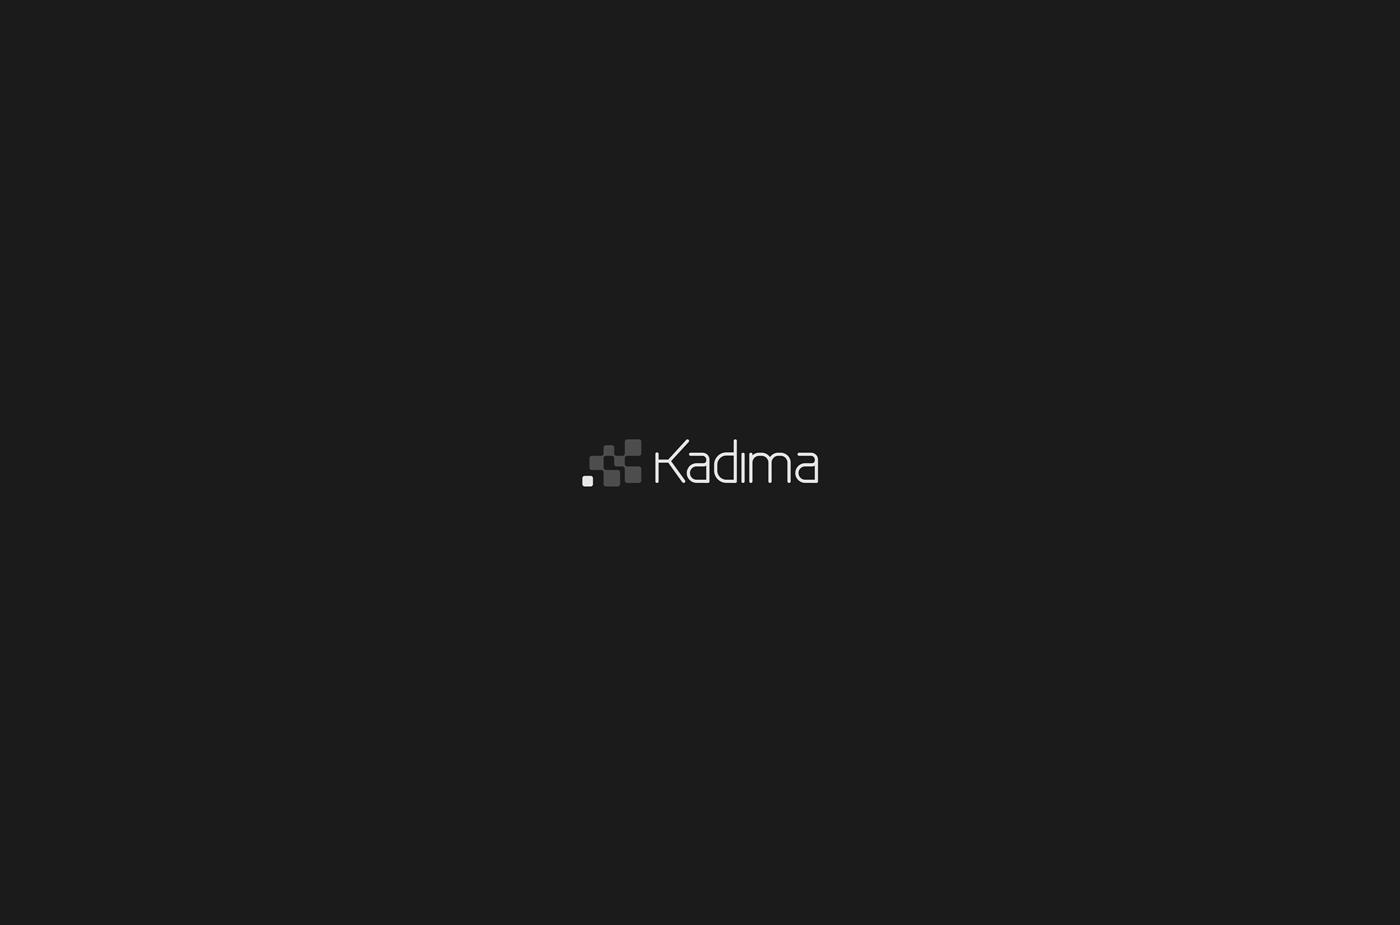 Kadima.png